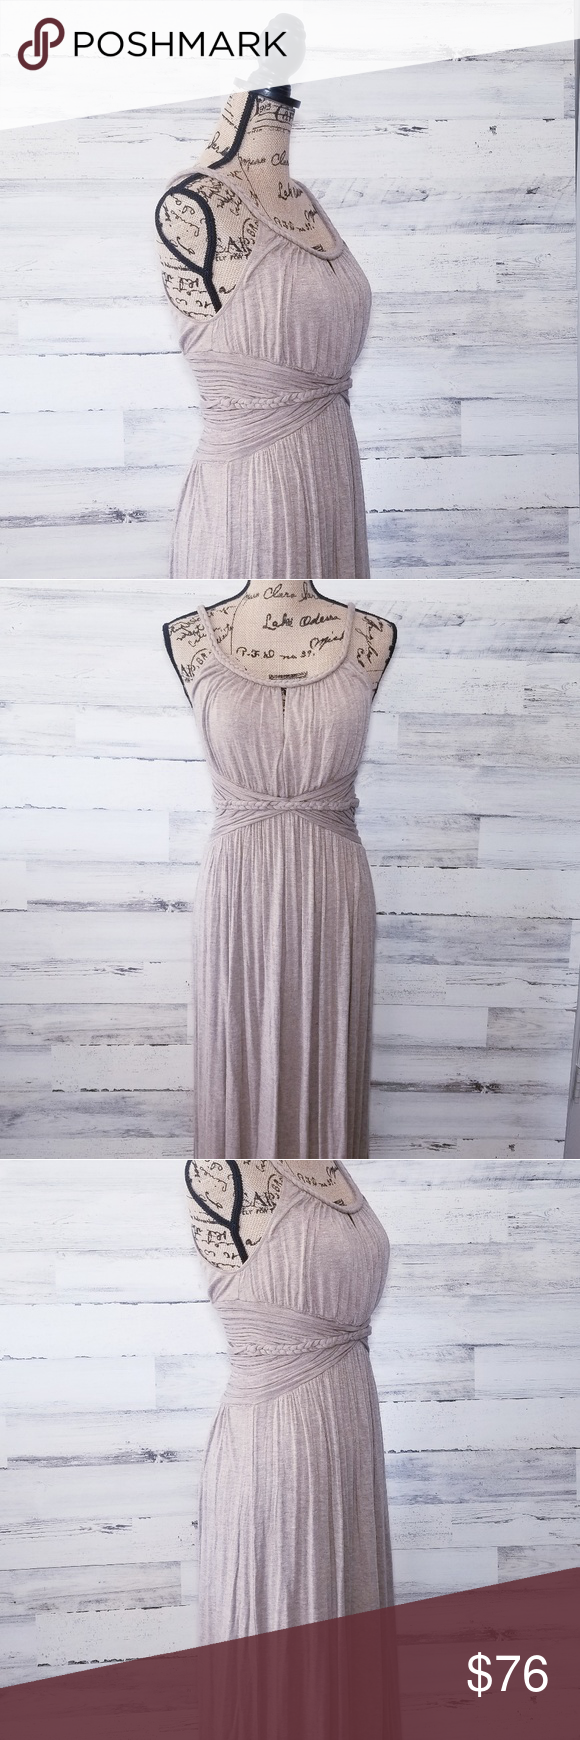 Max Studio Maxi Dress Tan Dresses Maxi Dress Max Studio Dress [ 1740 x 580 Pixel ]